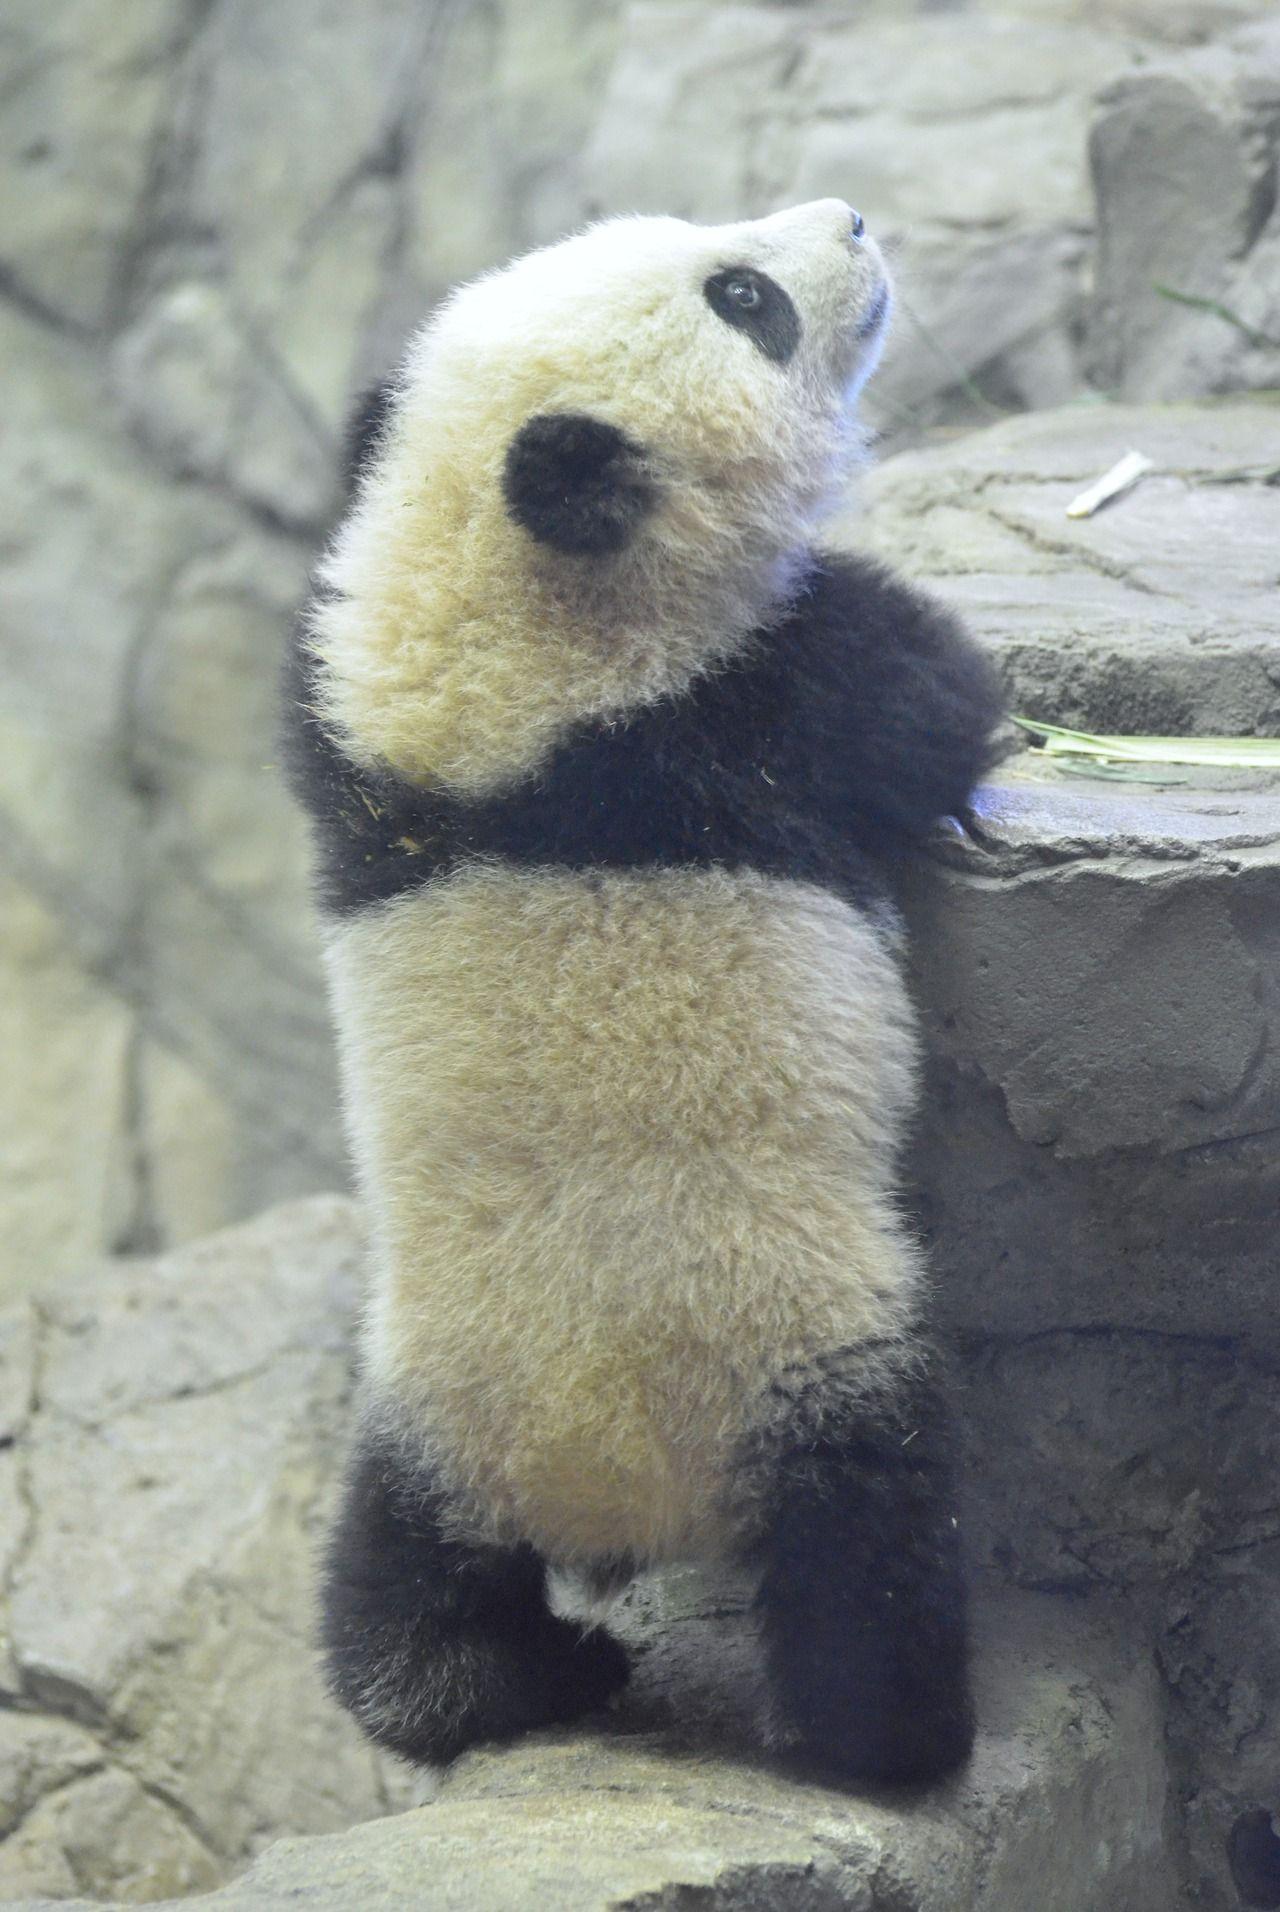 Pin By Morgana Himmelgrau On Animals Bears Panda Bao Bao Animals Beautiful Cute Baby Animals Panda Bear